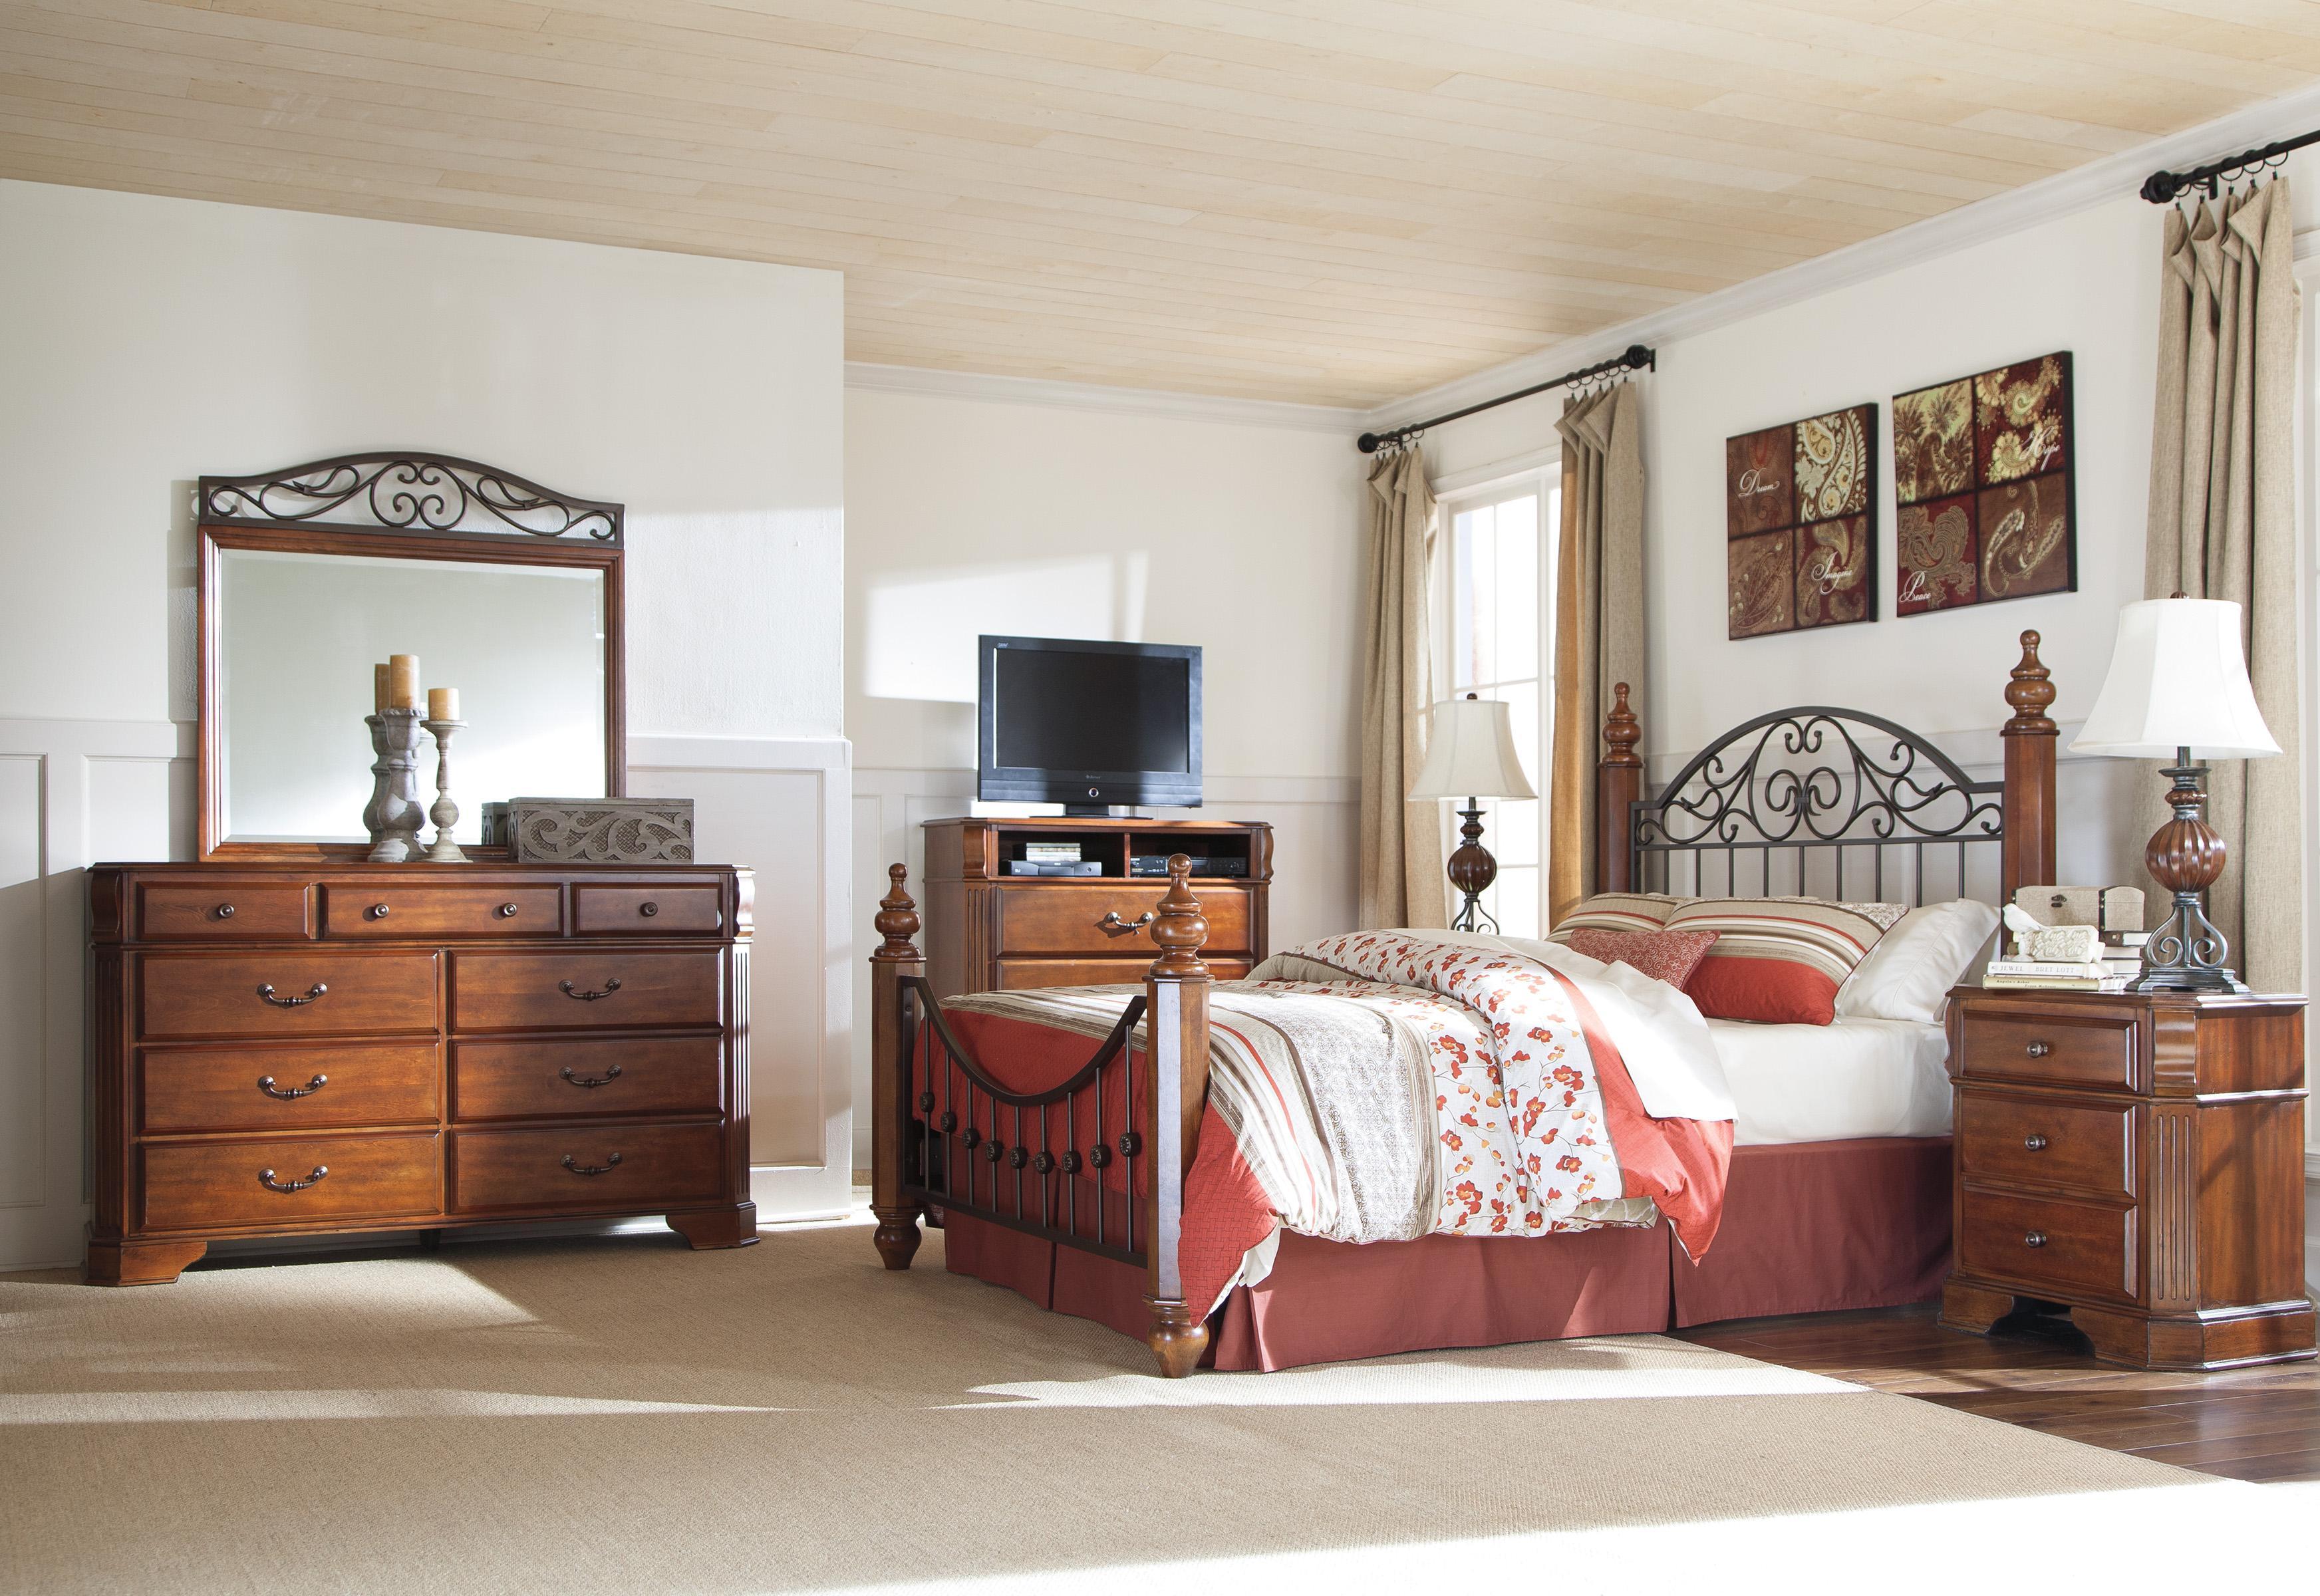 Styleline wyatt queen bedroom group efo furniture outlet bedroom group dunmore scranton for Ashley wilkes bedroom collection